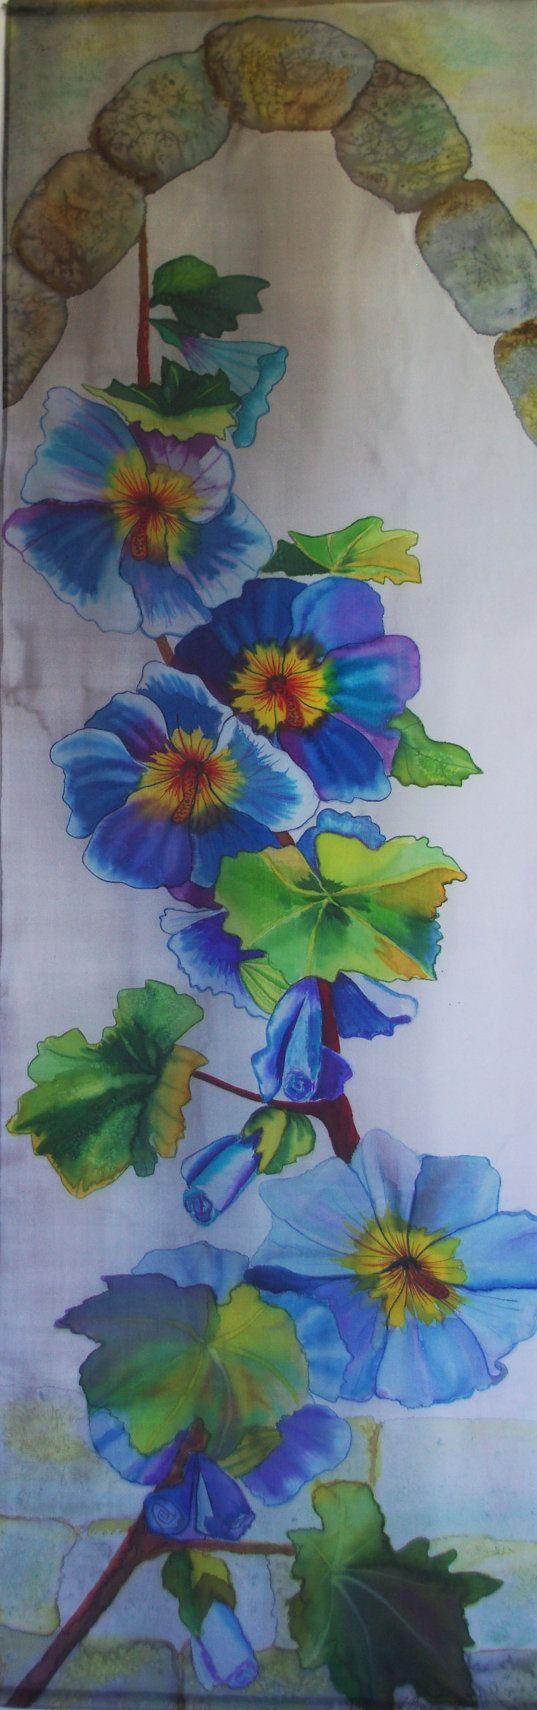 Painting on silk Morning glory Wall hanging Batik by ArtbyLora